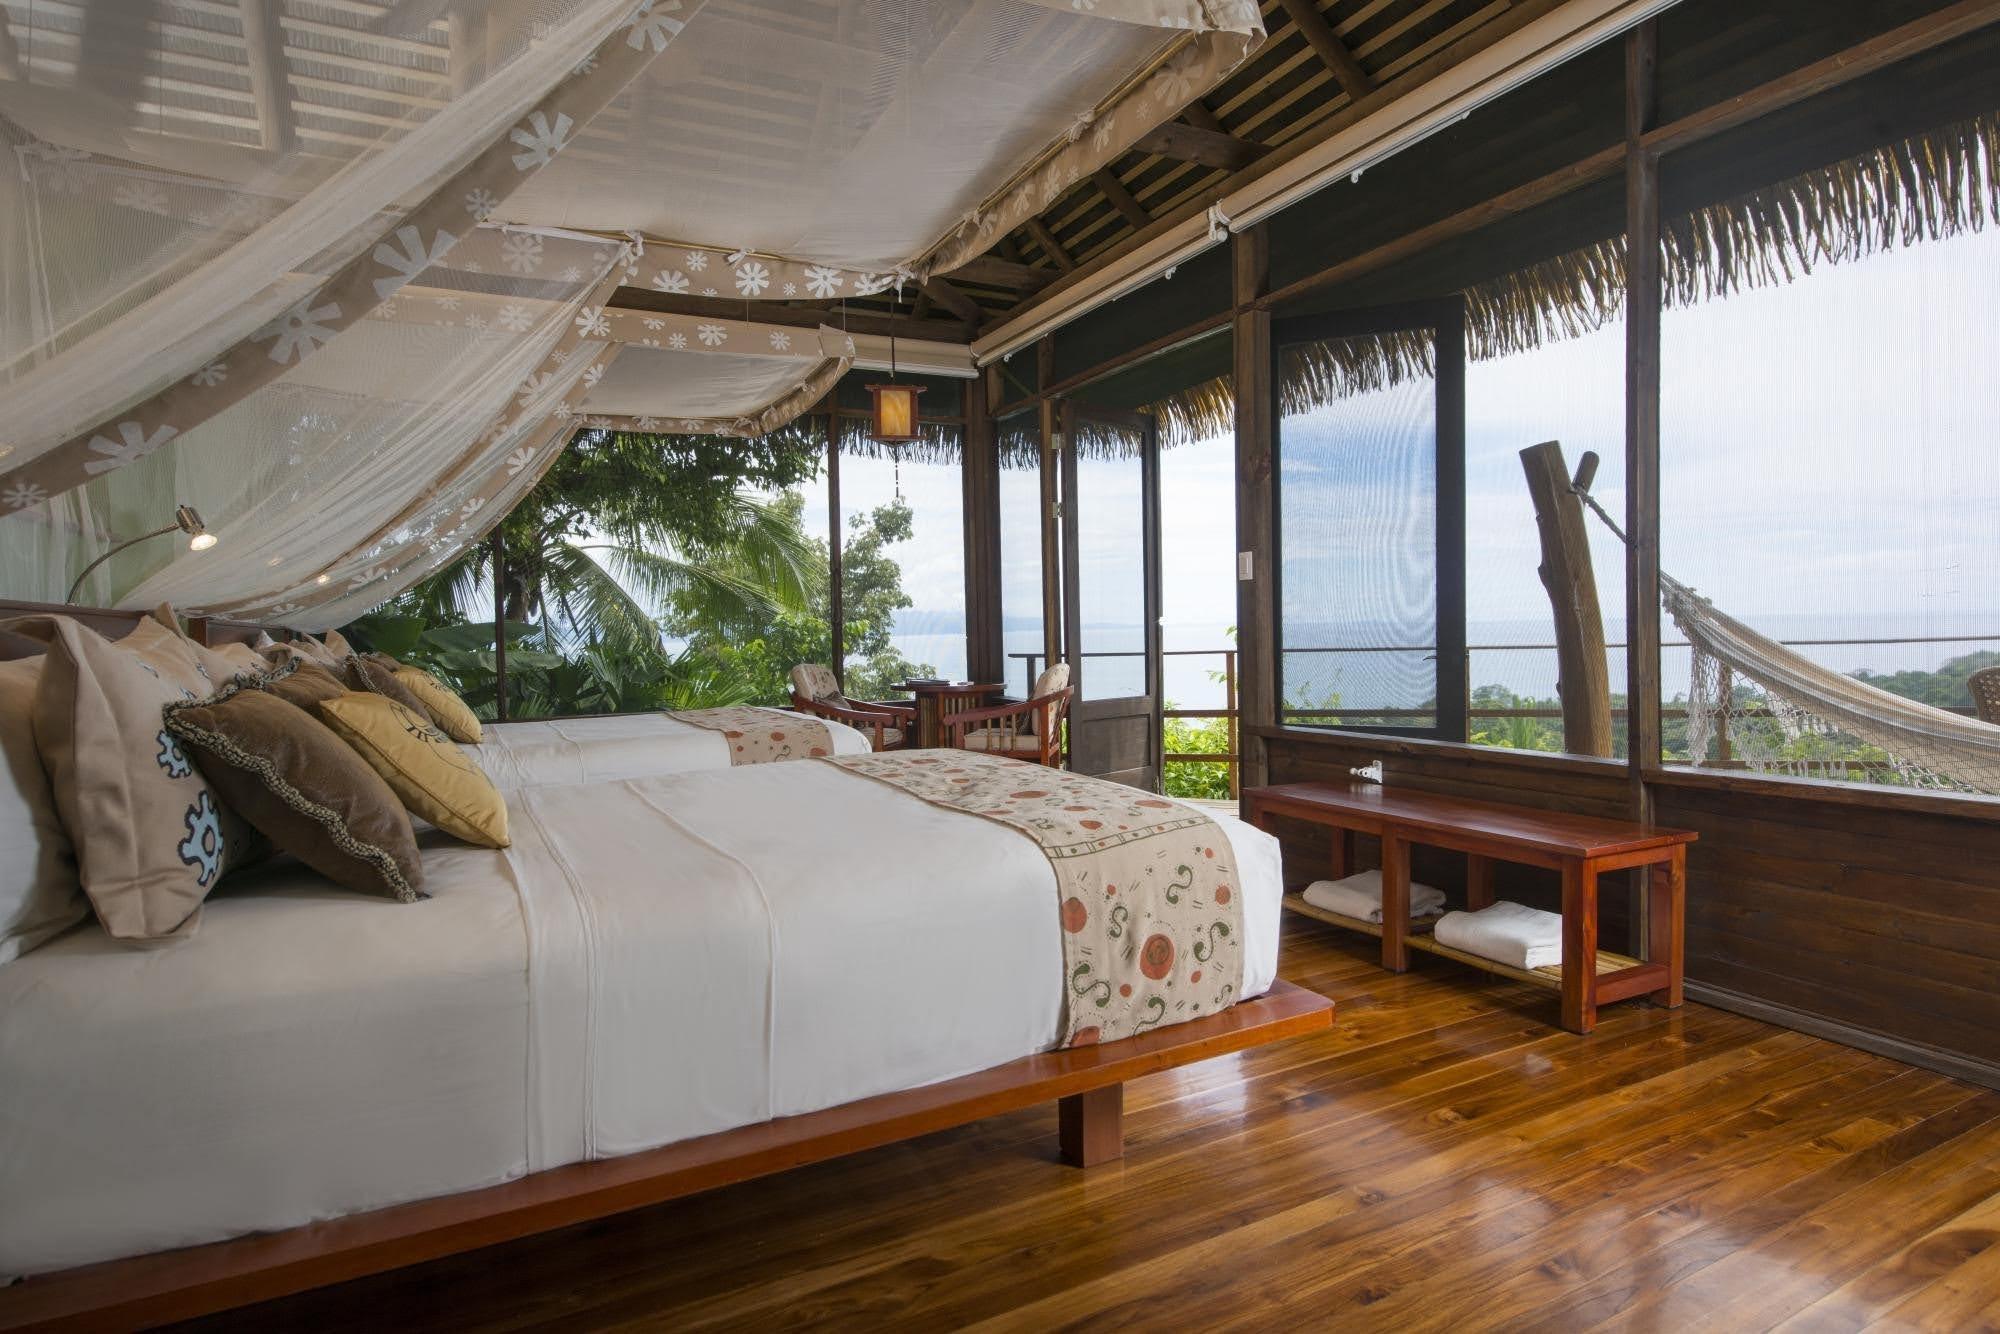 duurzame-accommodatie-costa-rica